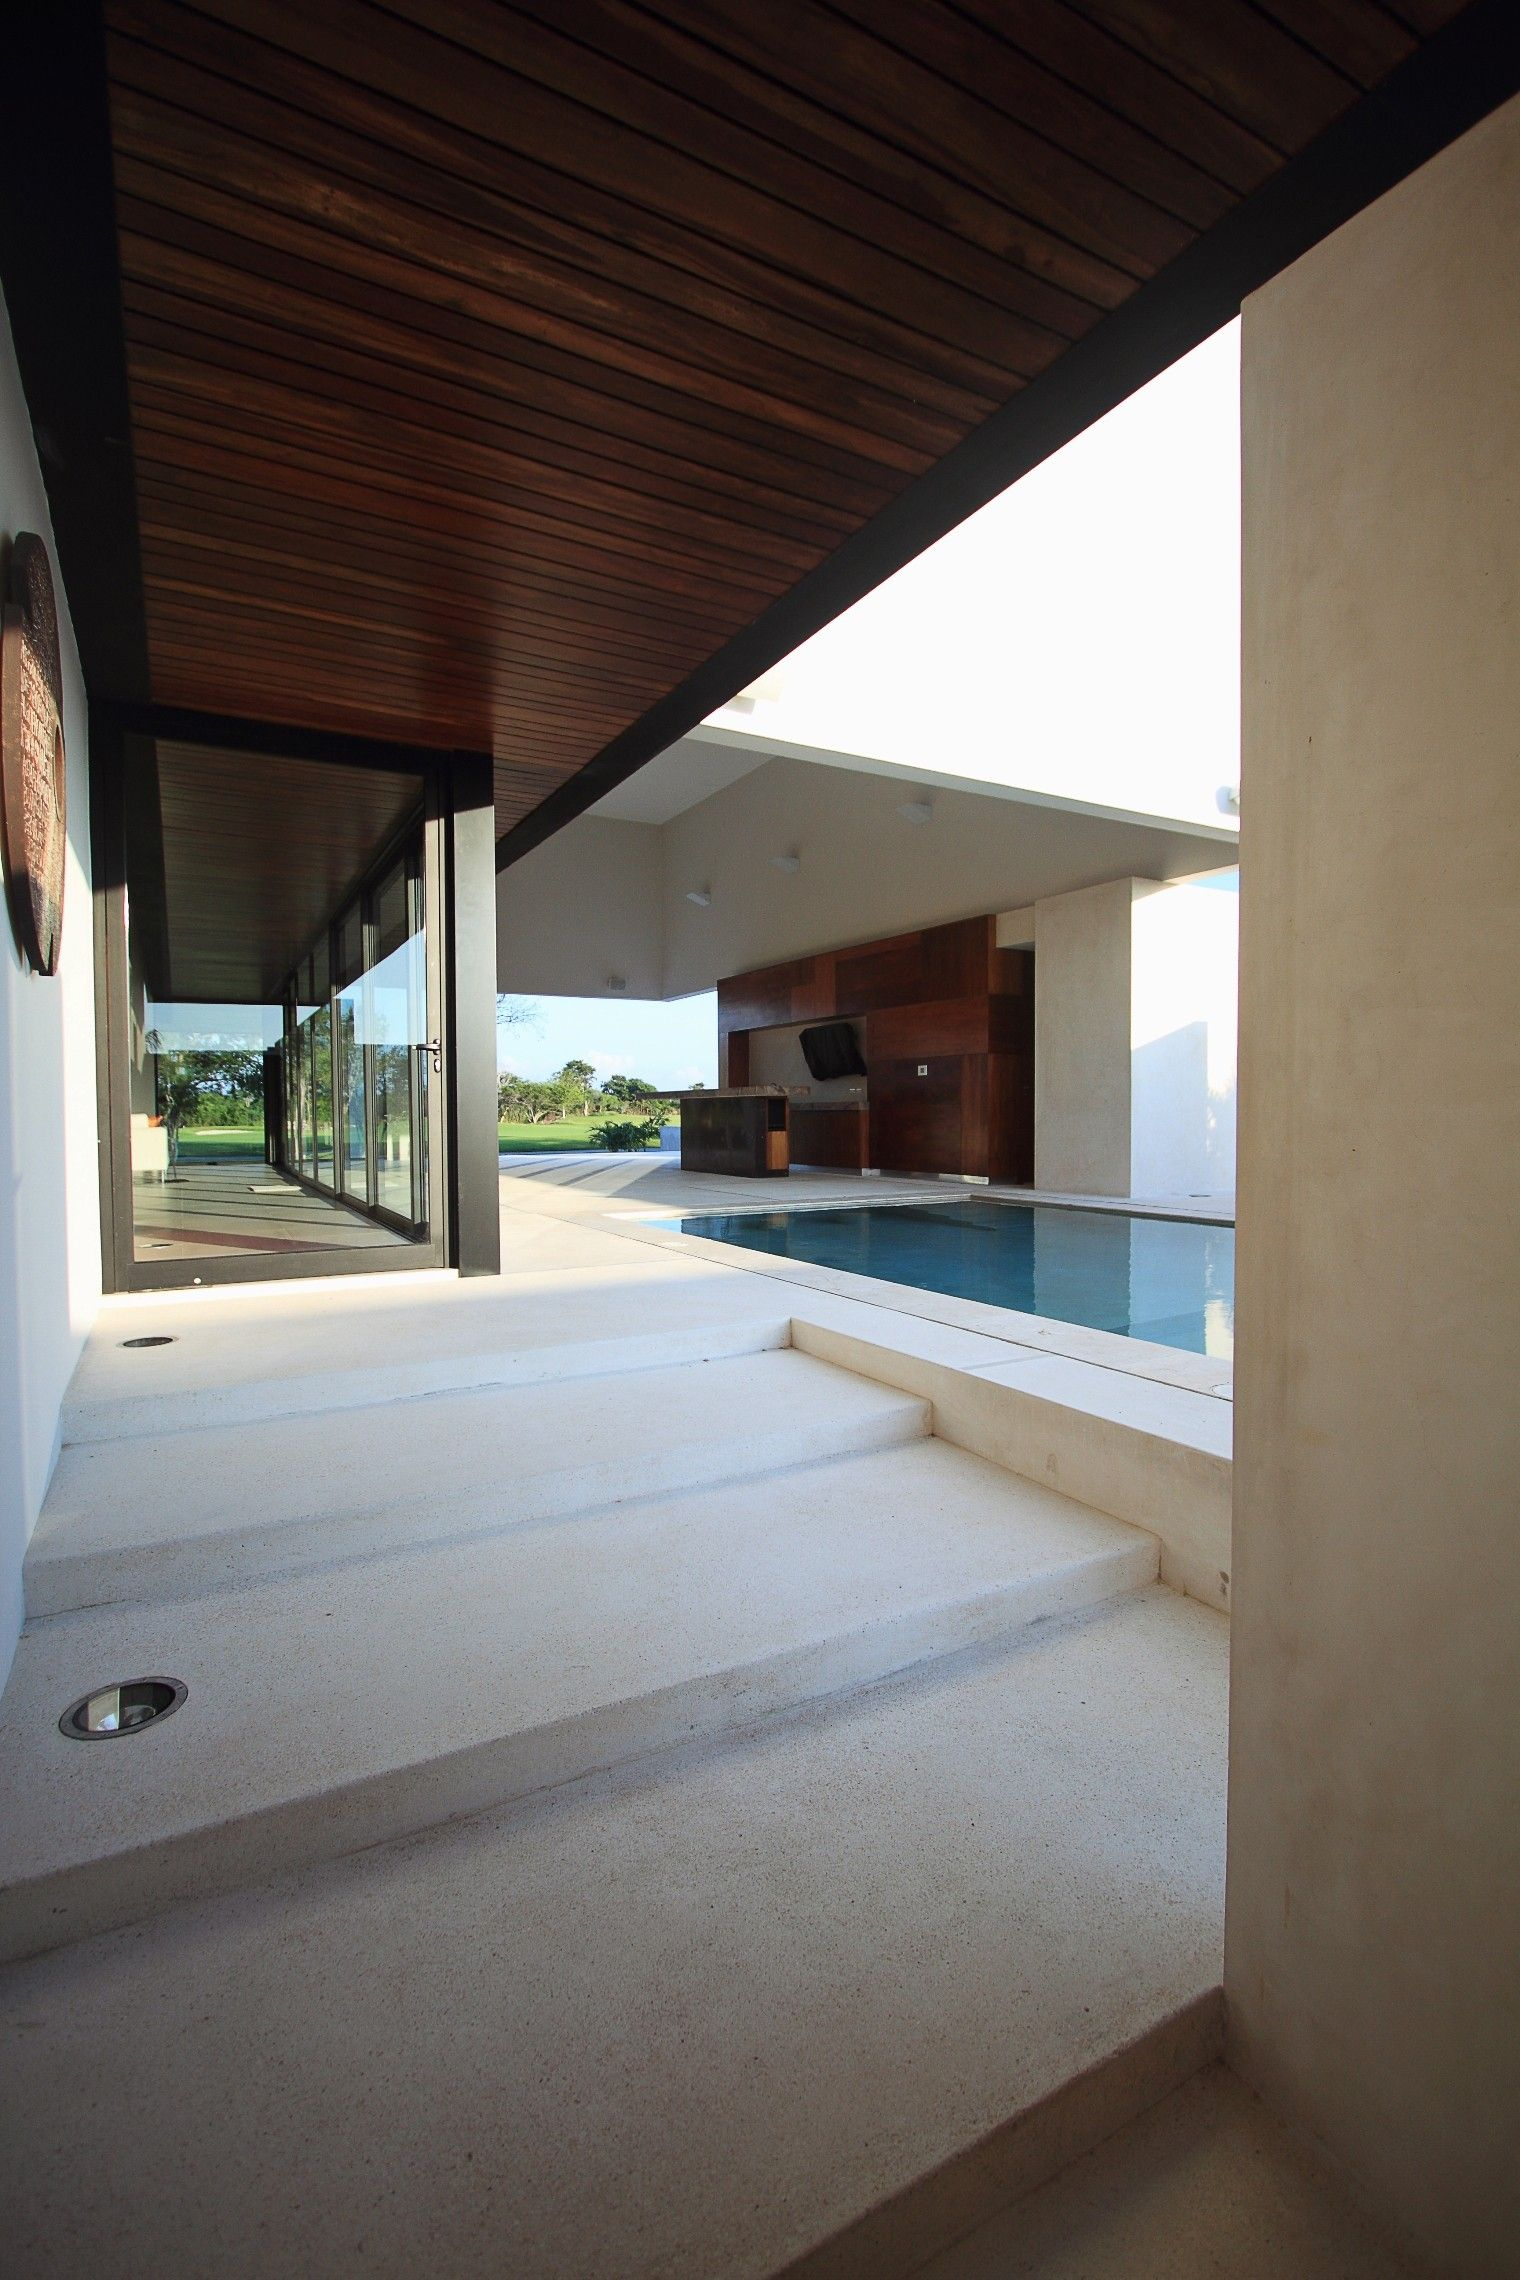 Galería de Casa MCC / Seijo Peon Arquitectos - 5